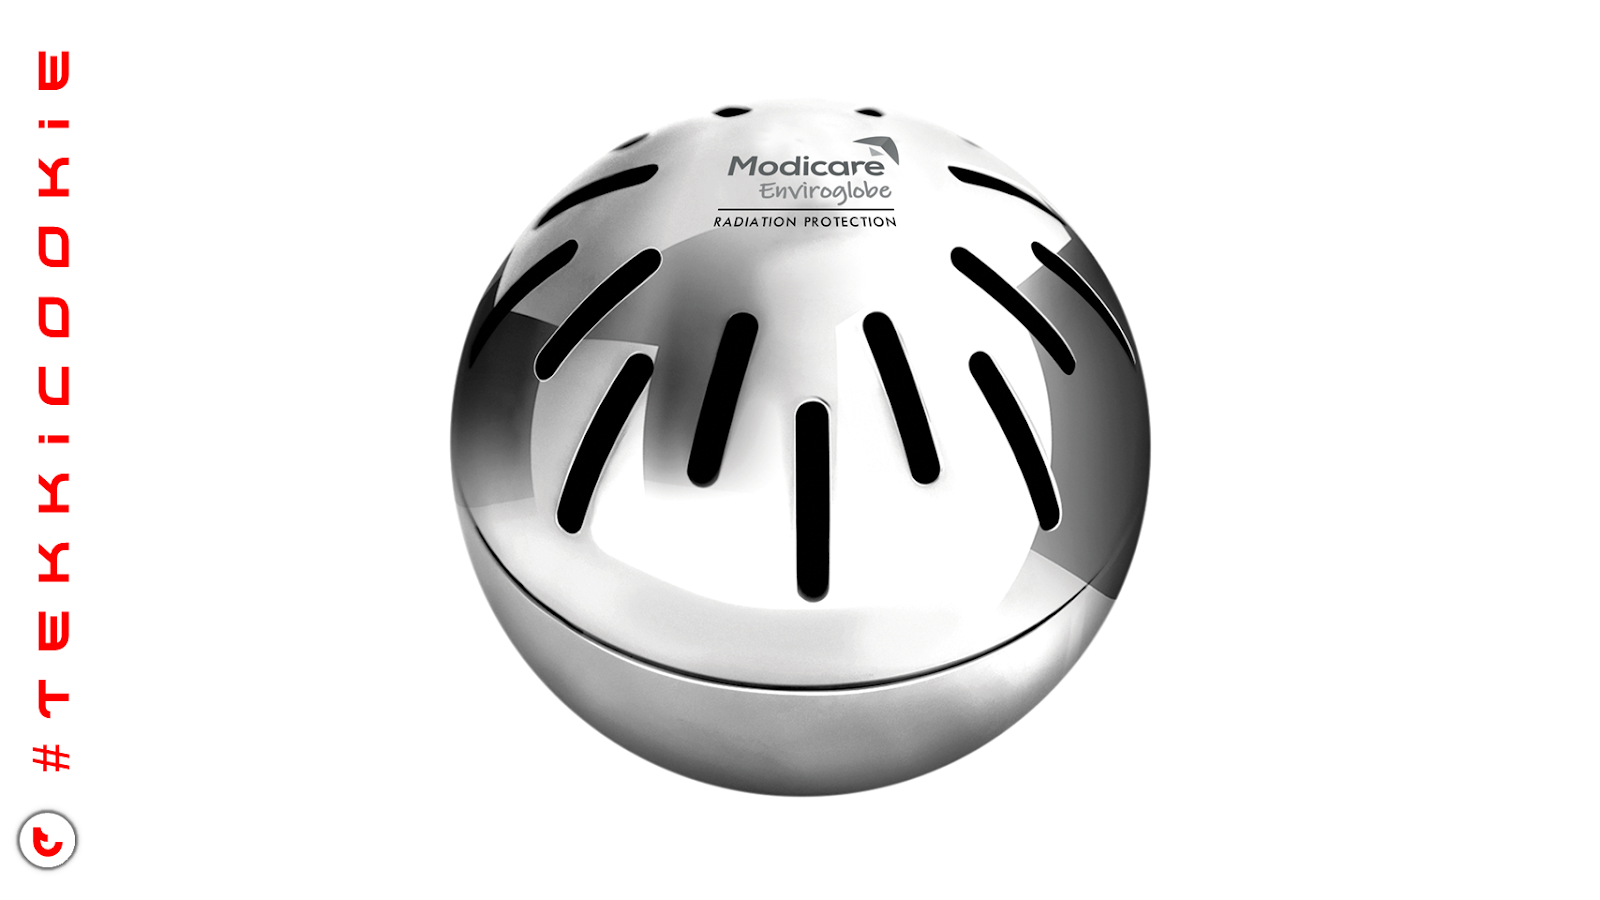 Enviroglobe Radiation Purifier by Modicare